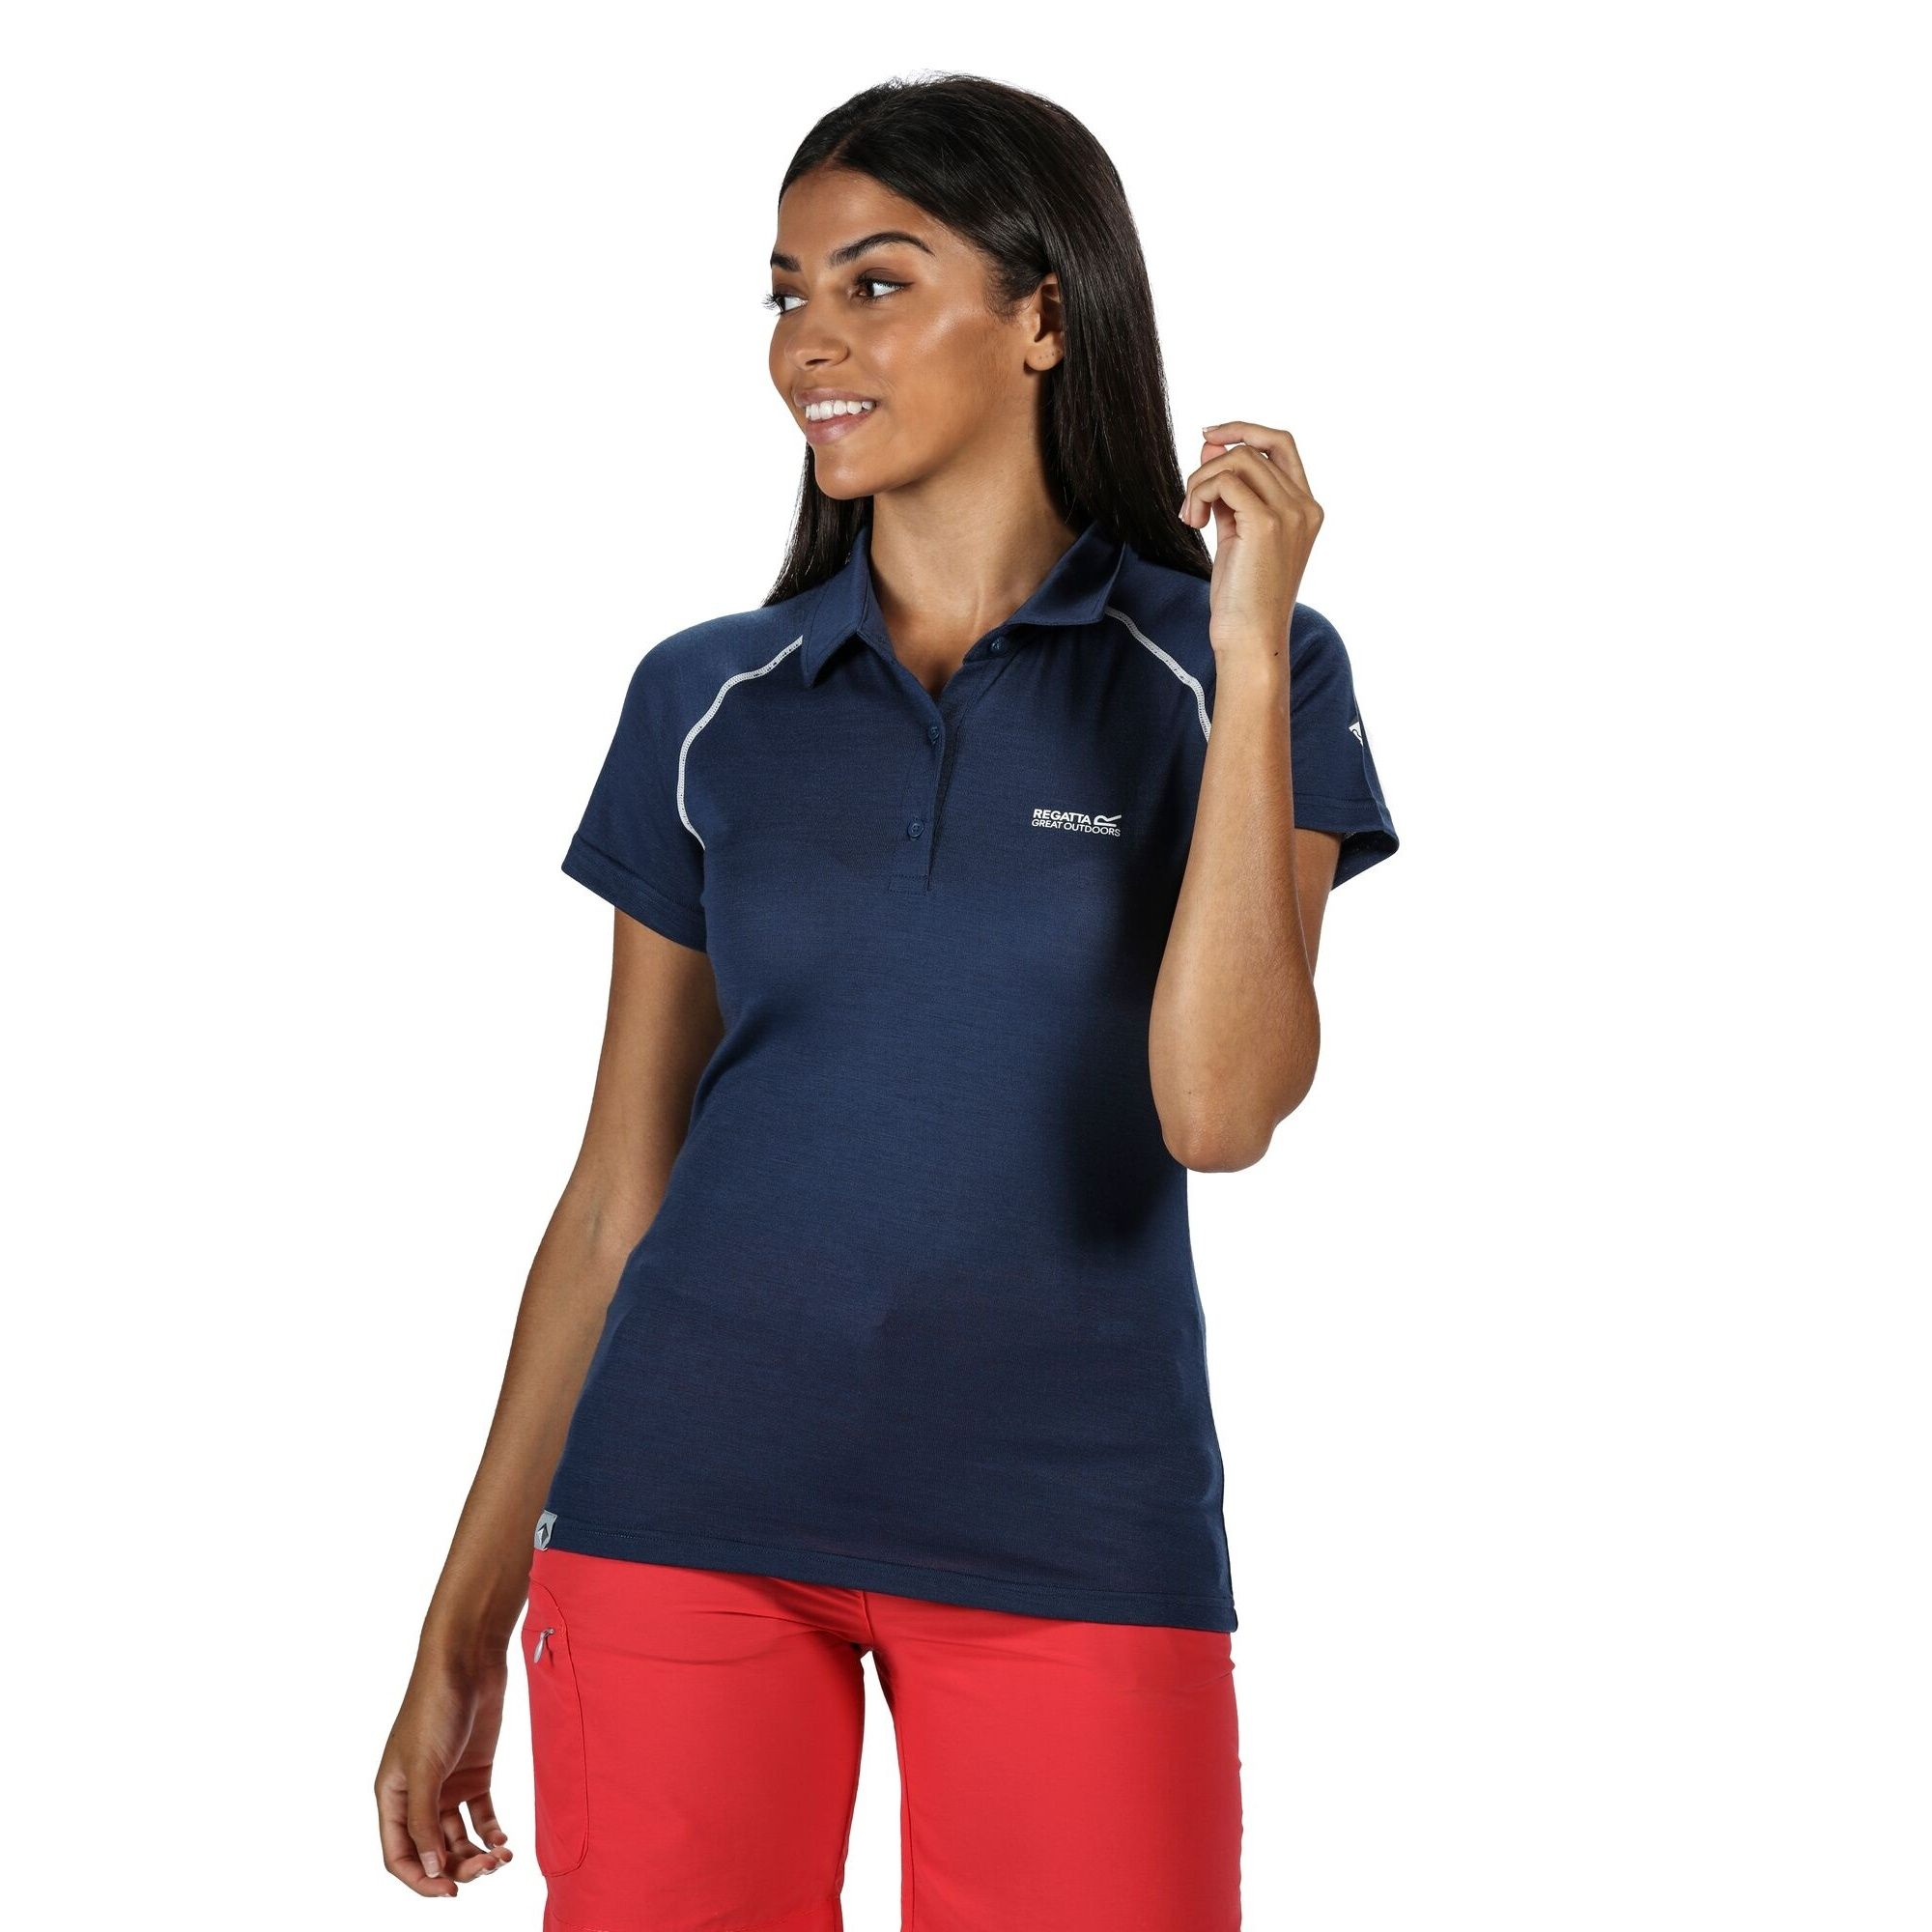 Regatta Womens/Ladies Kalter Polo Shirt